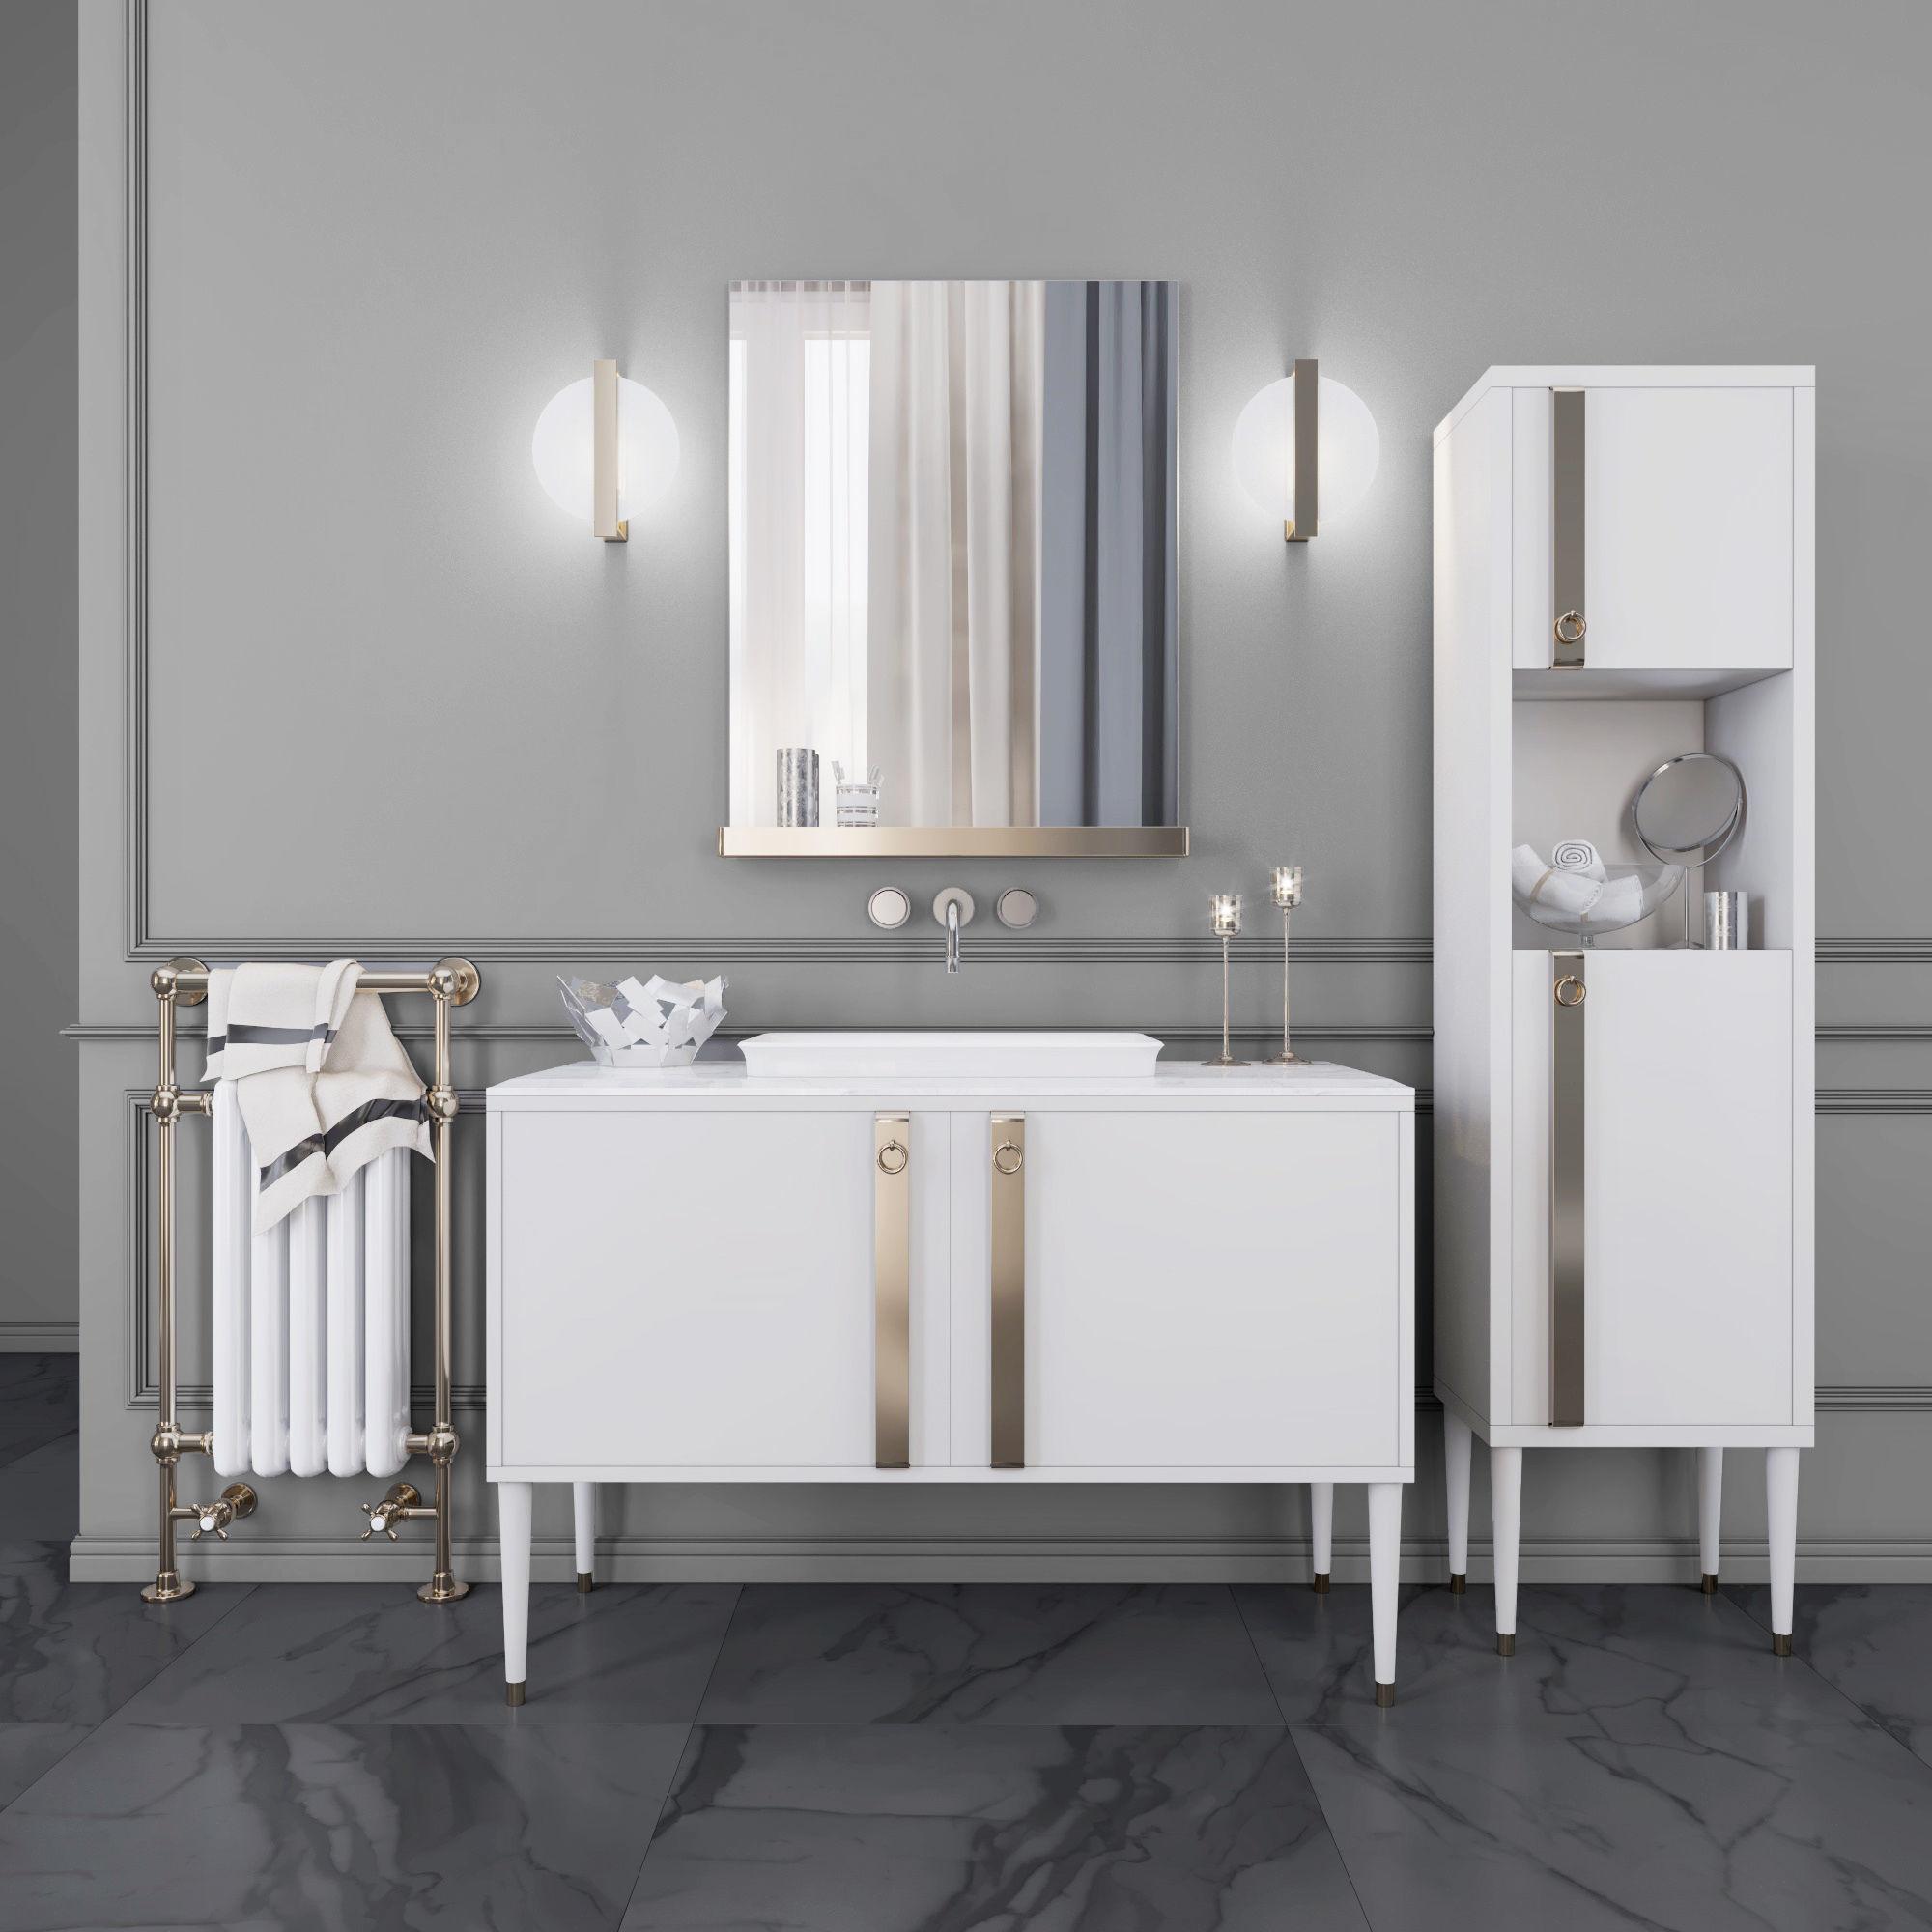 Mia Italia TRIBECA 07 Bathroom furniture 3D | CGTrader